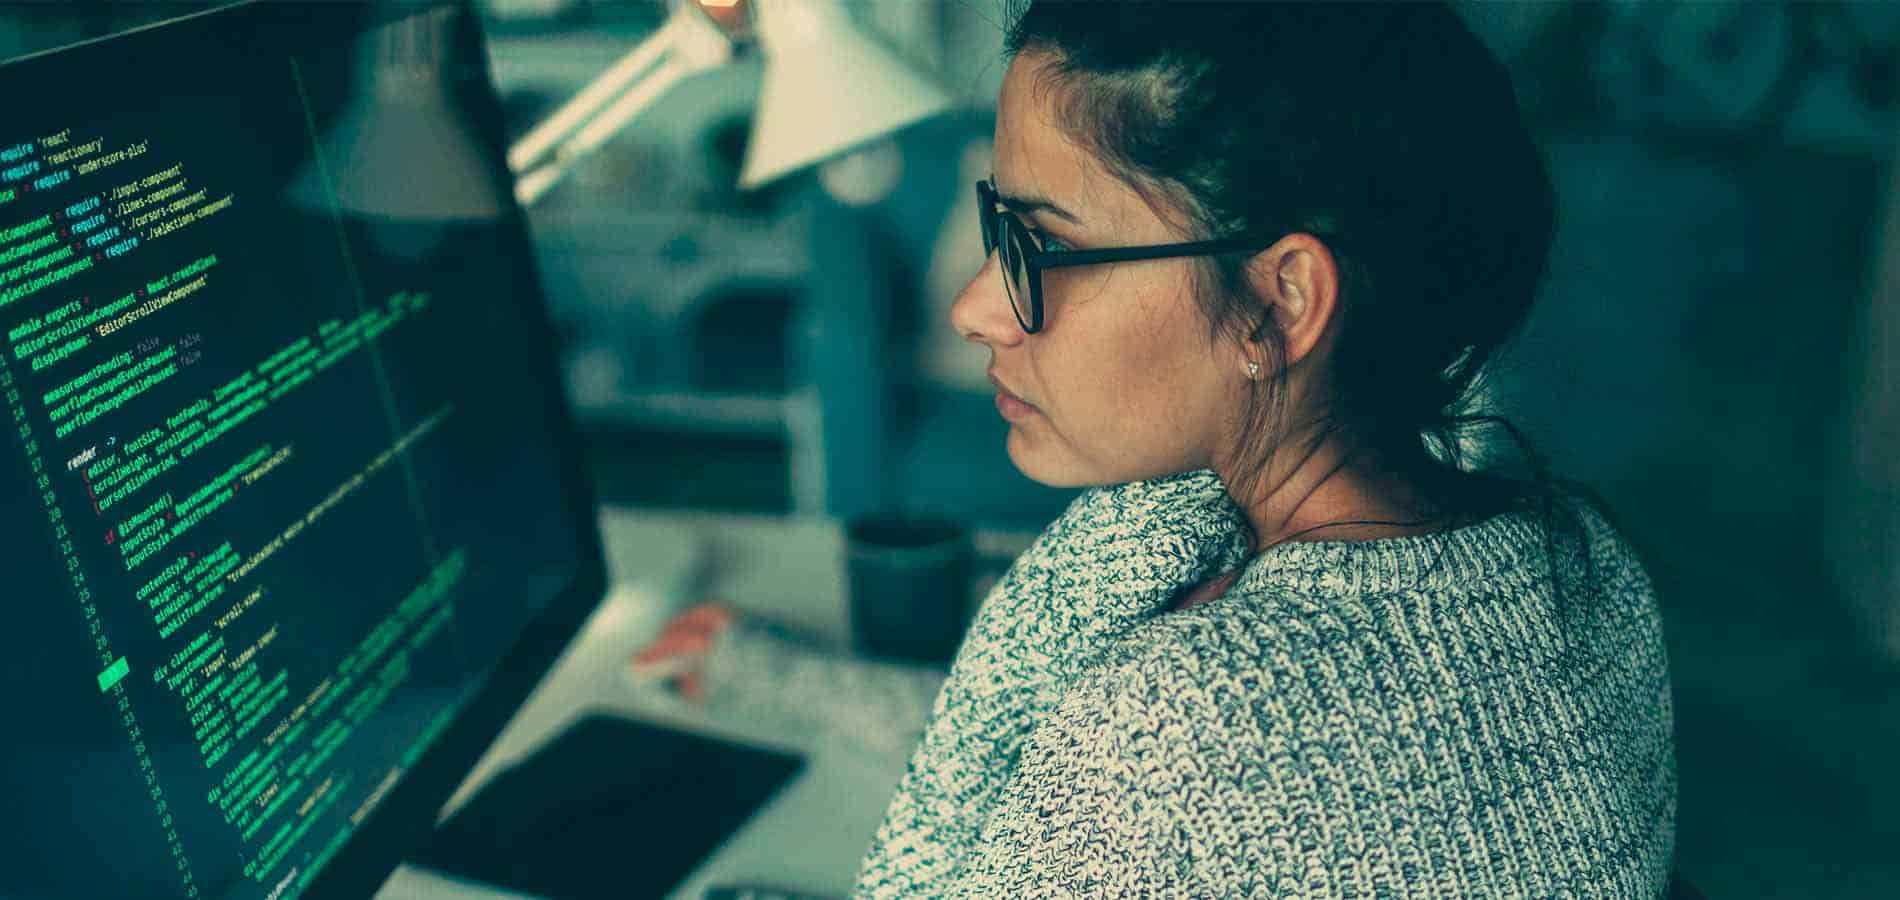 10 skills Coders need